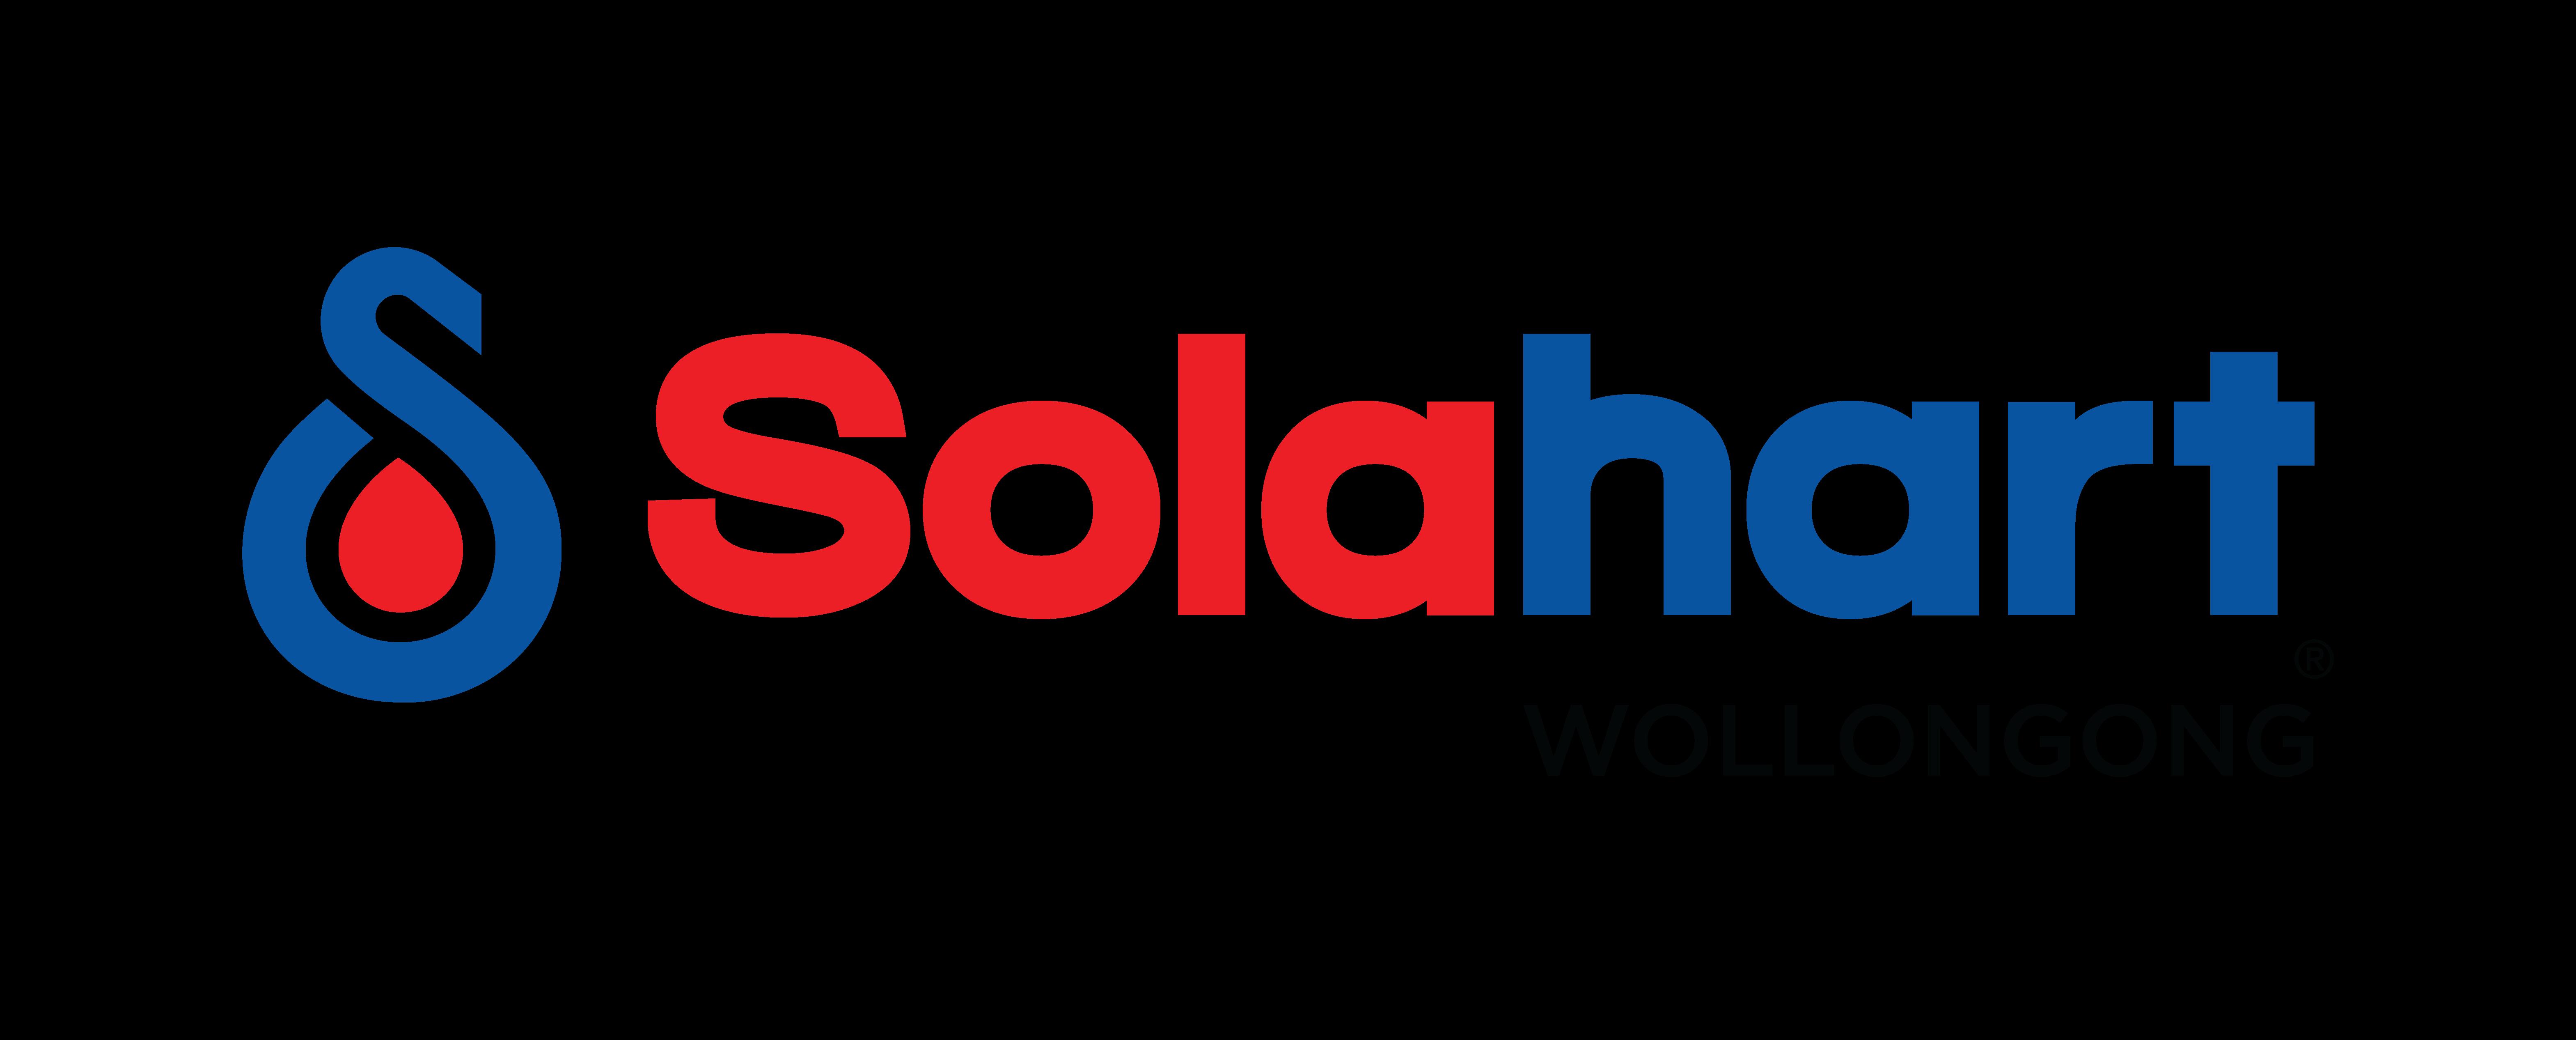 Marketing Agency for Solar Businesses